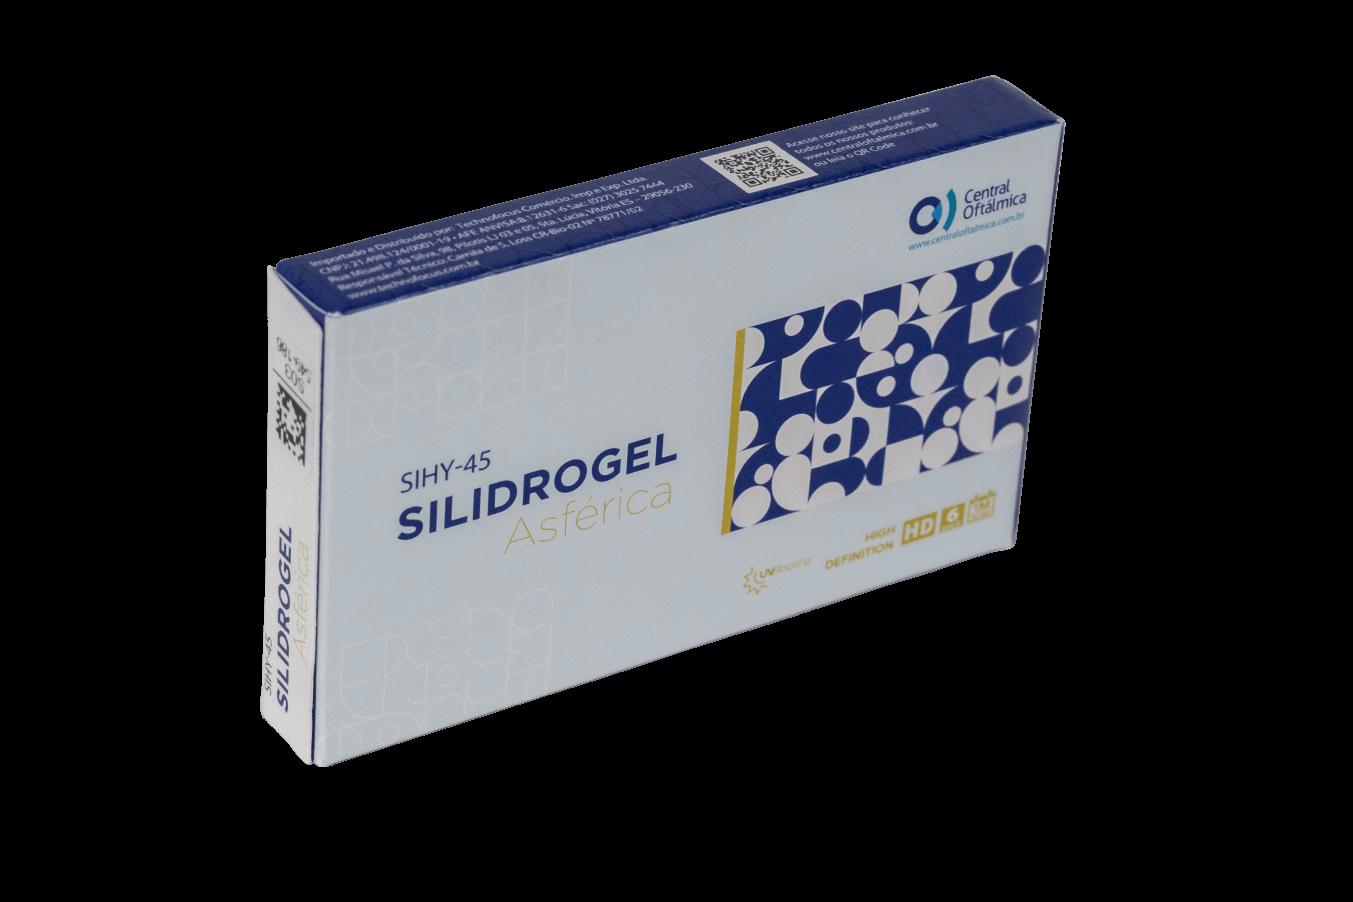 silidrogel-asférica